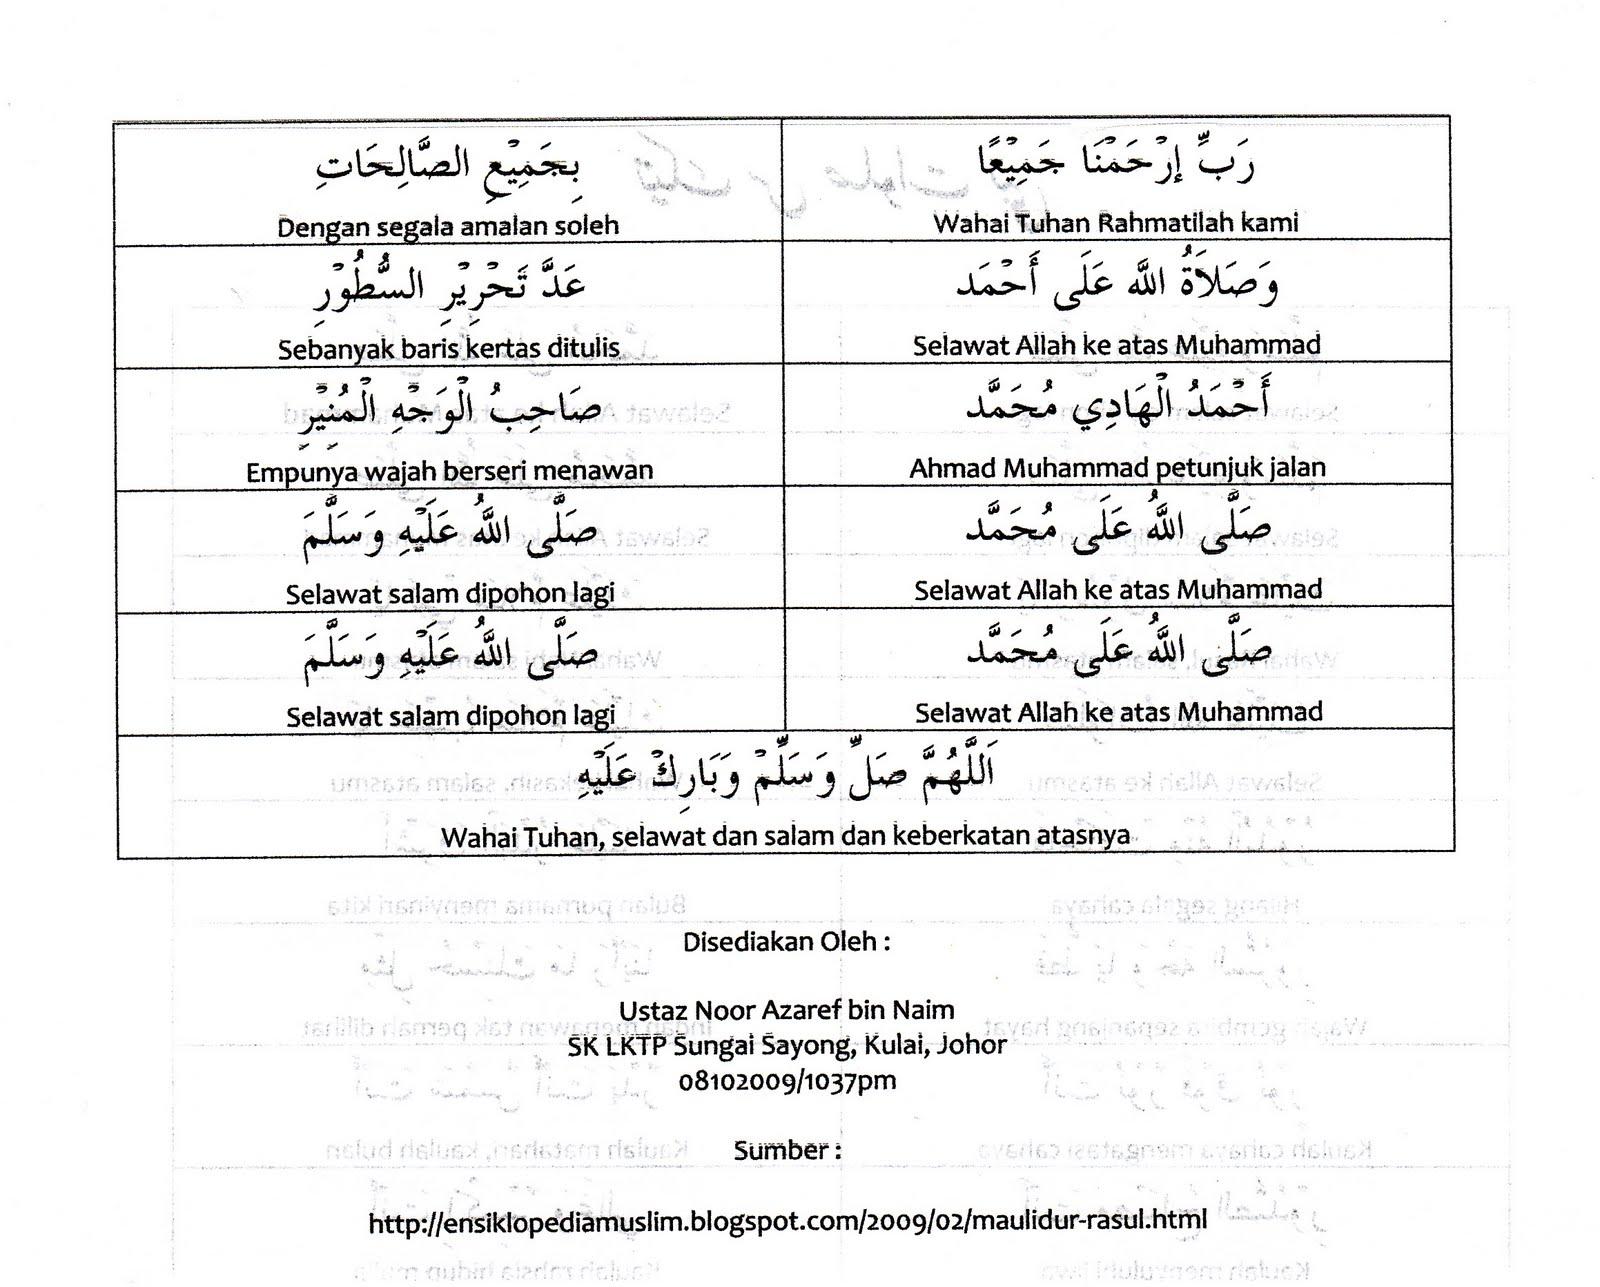 Abu Amirin: TEKS SELAWAT